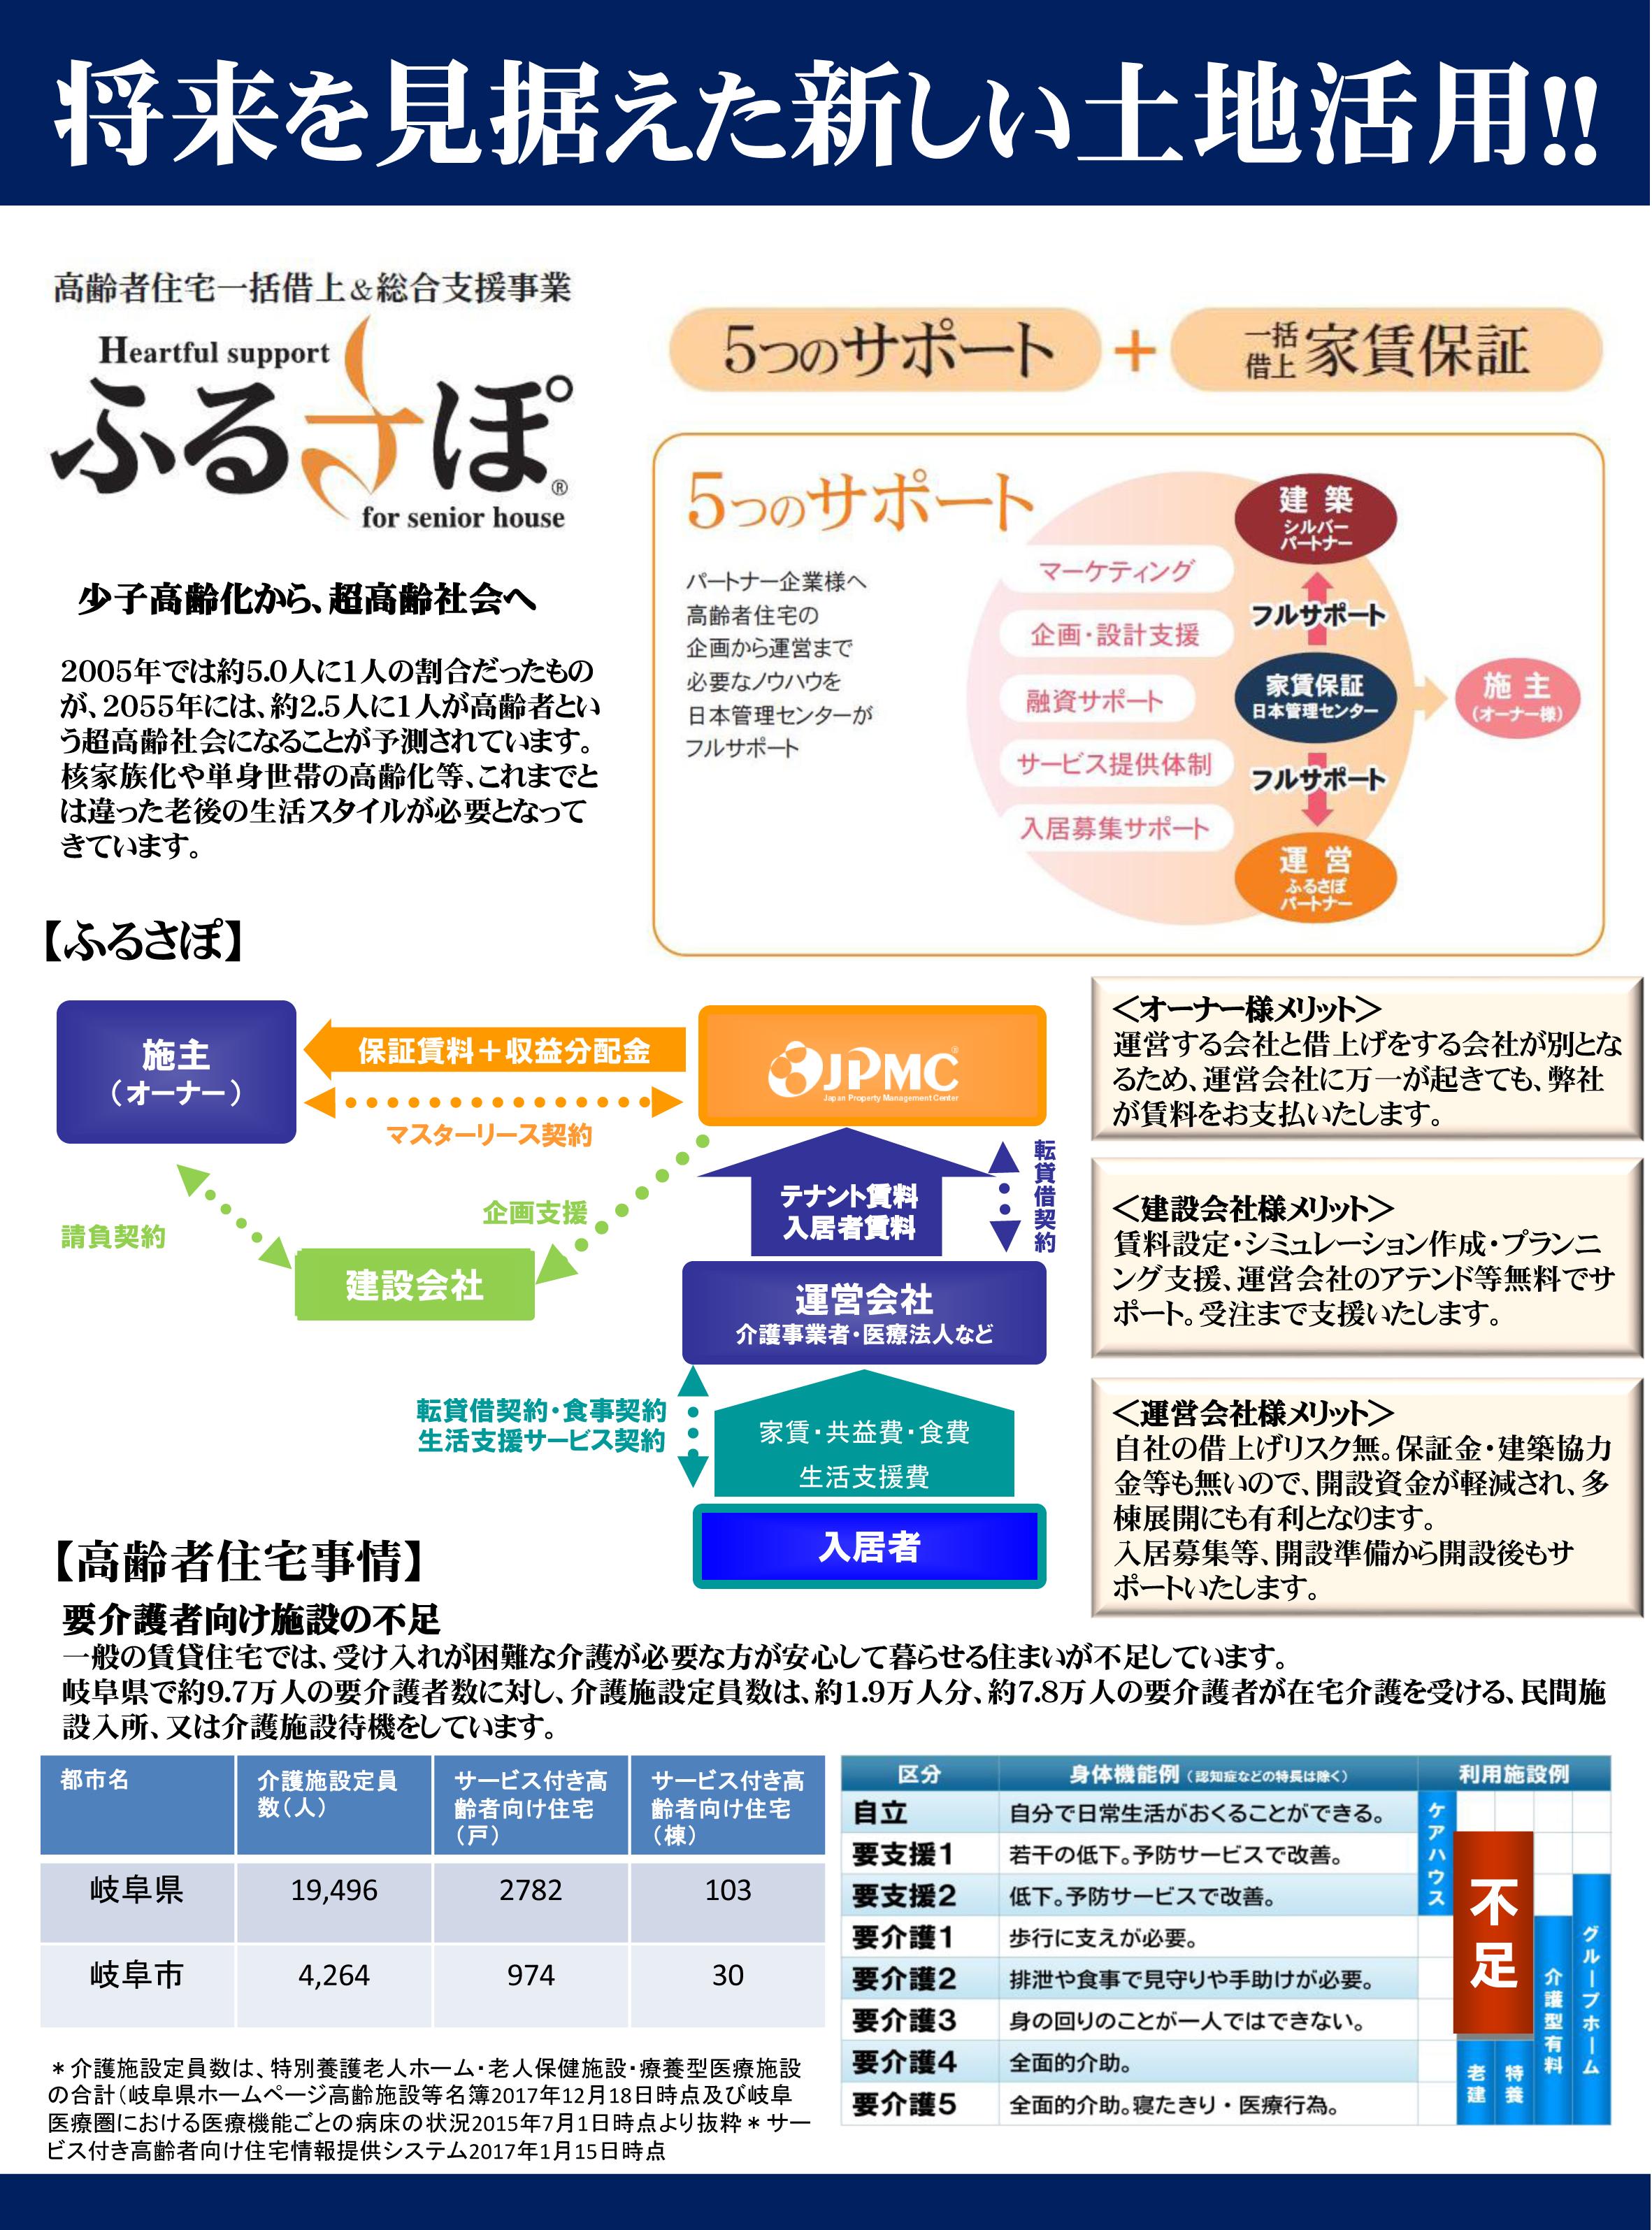 管理 センター 株式 会社 日本